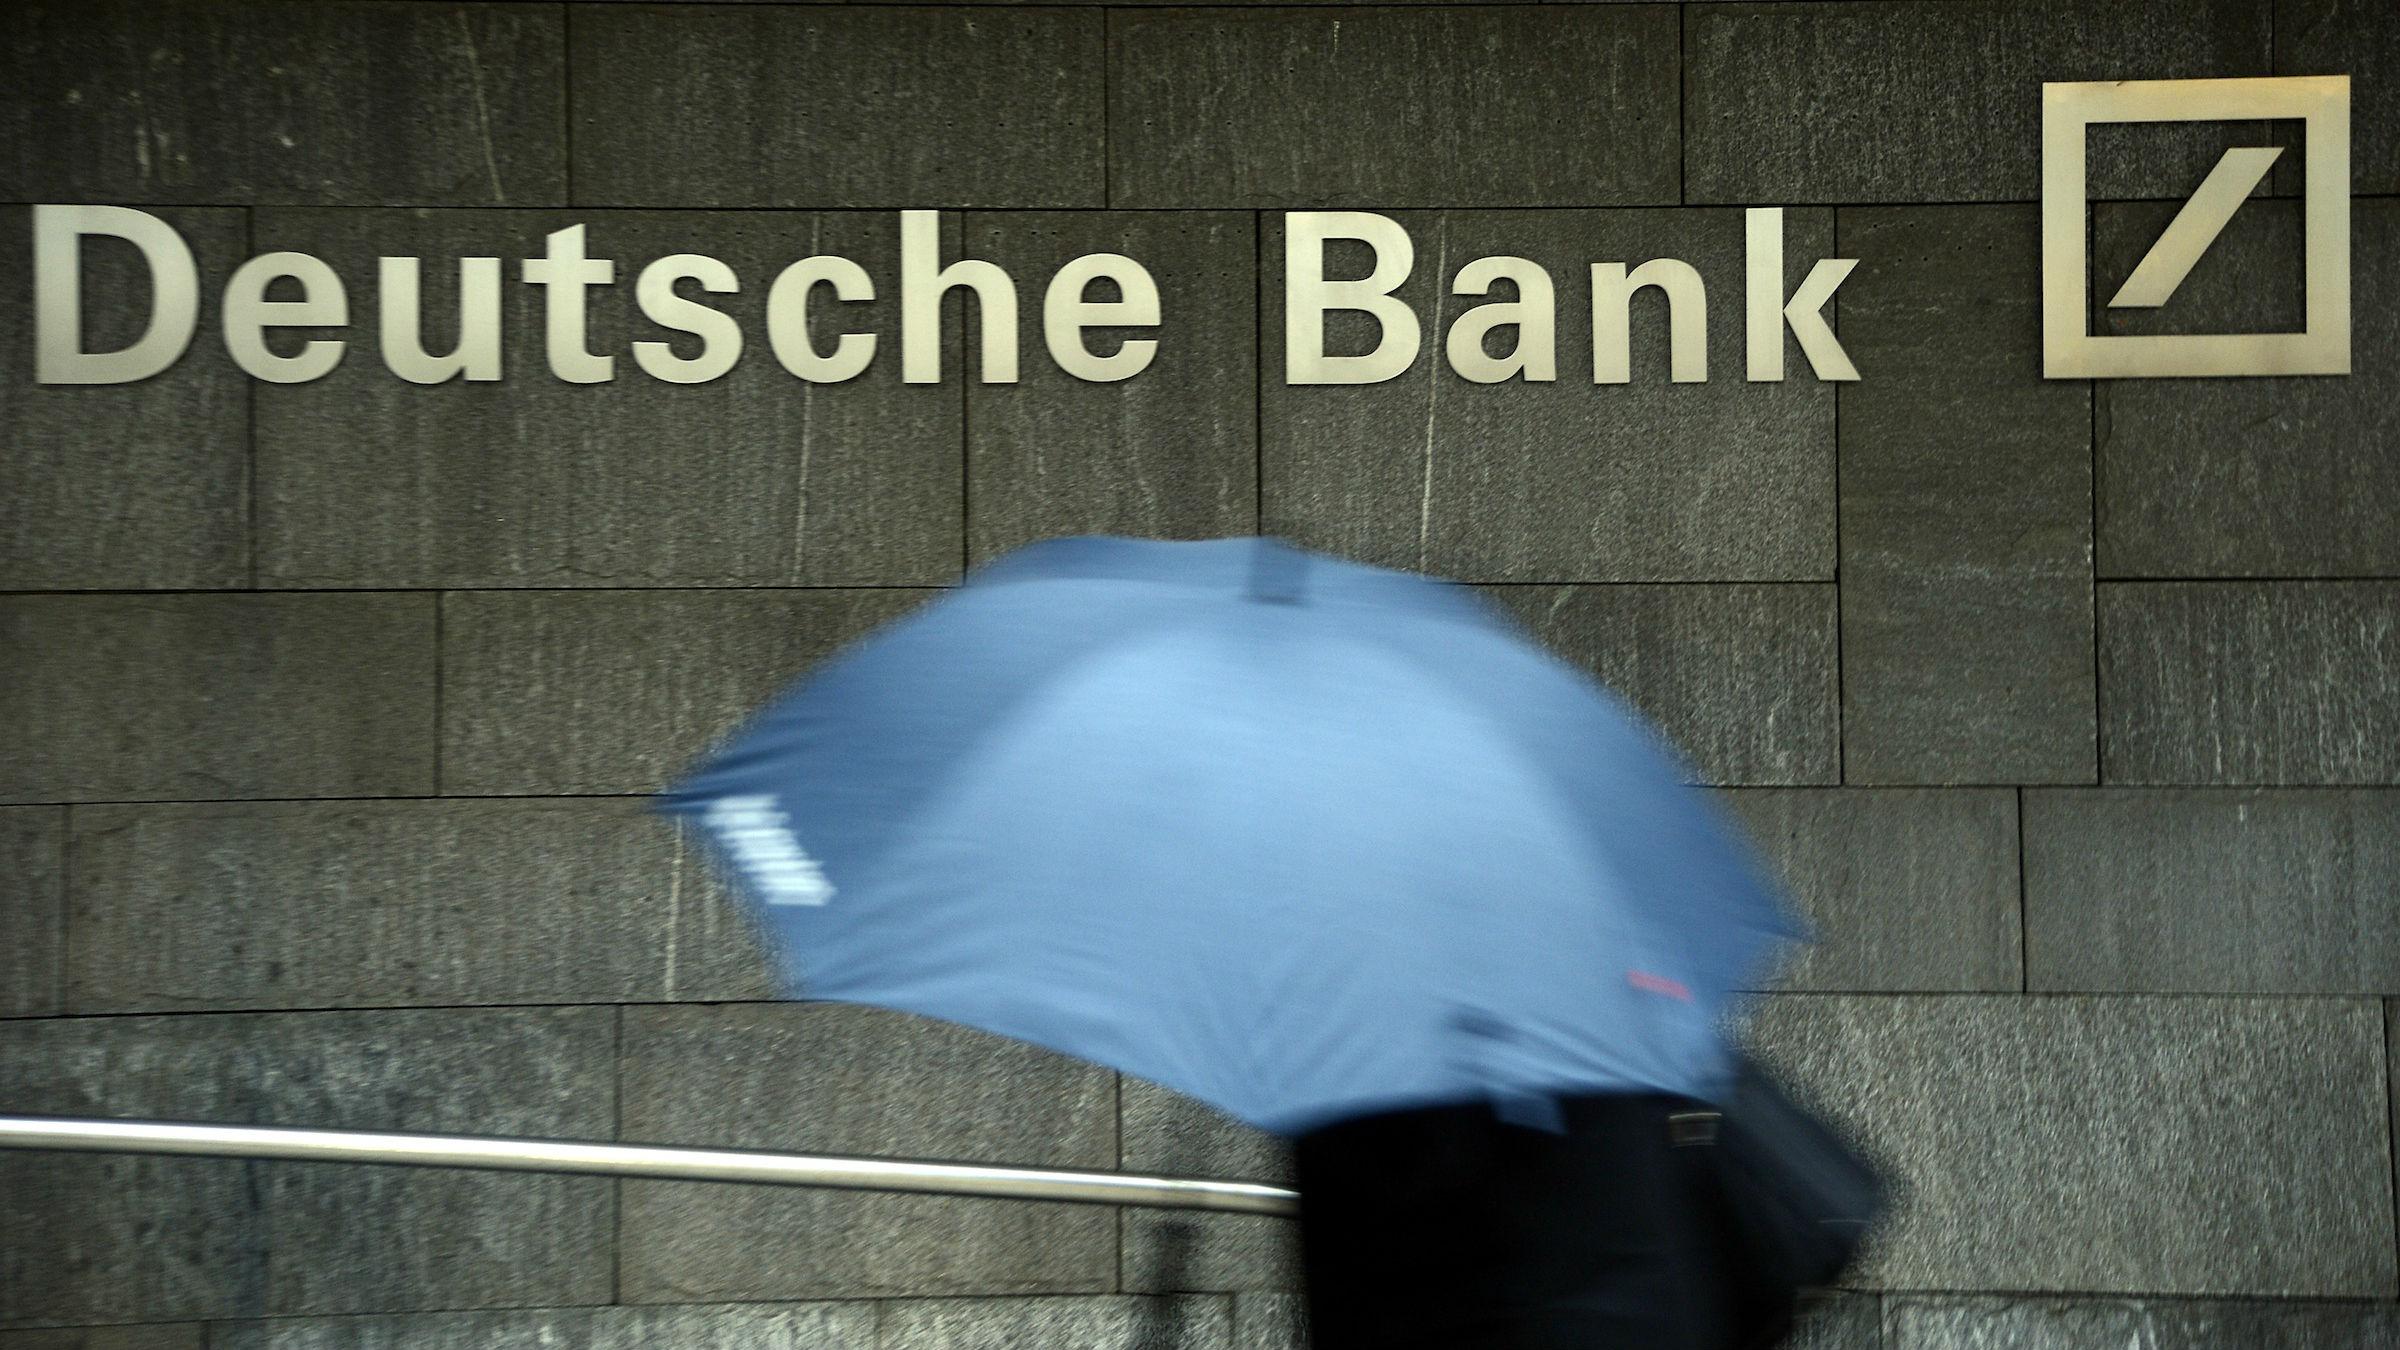 Deutsche Bank reported a fourth quarter loss of $3.5 billion.